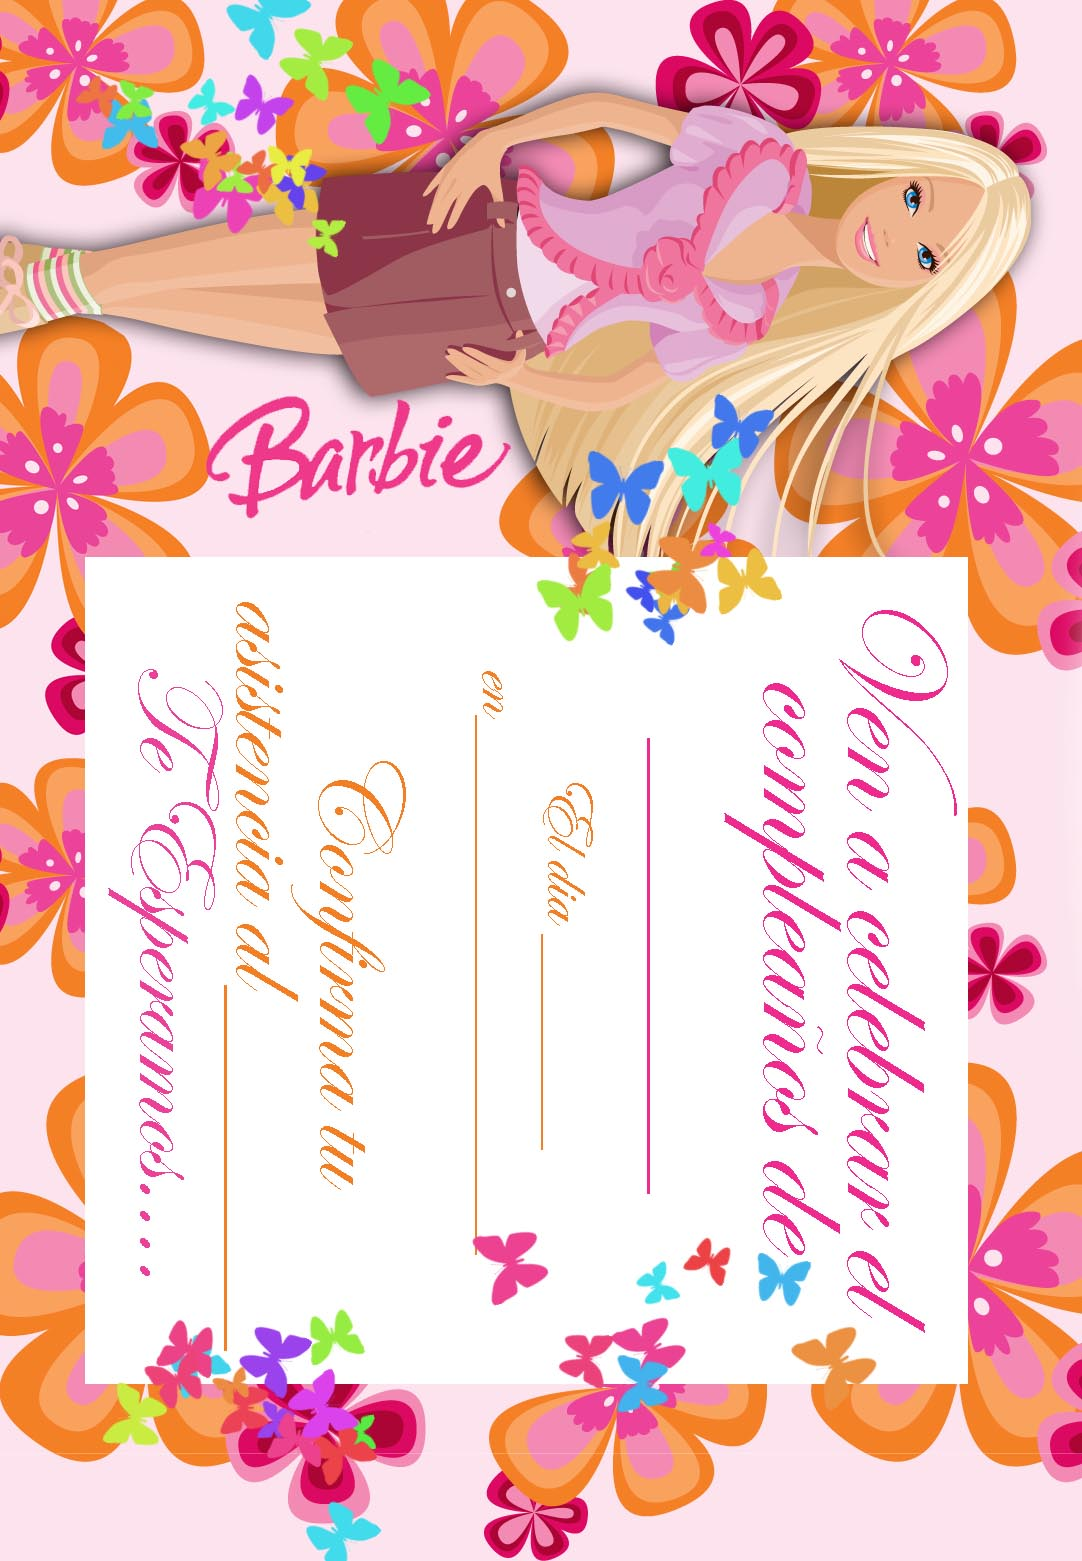 Barbie Coloring Pages Imprimir Gratuitamente Tarjetas De